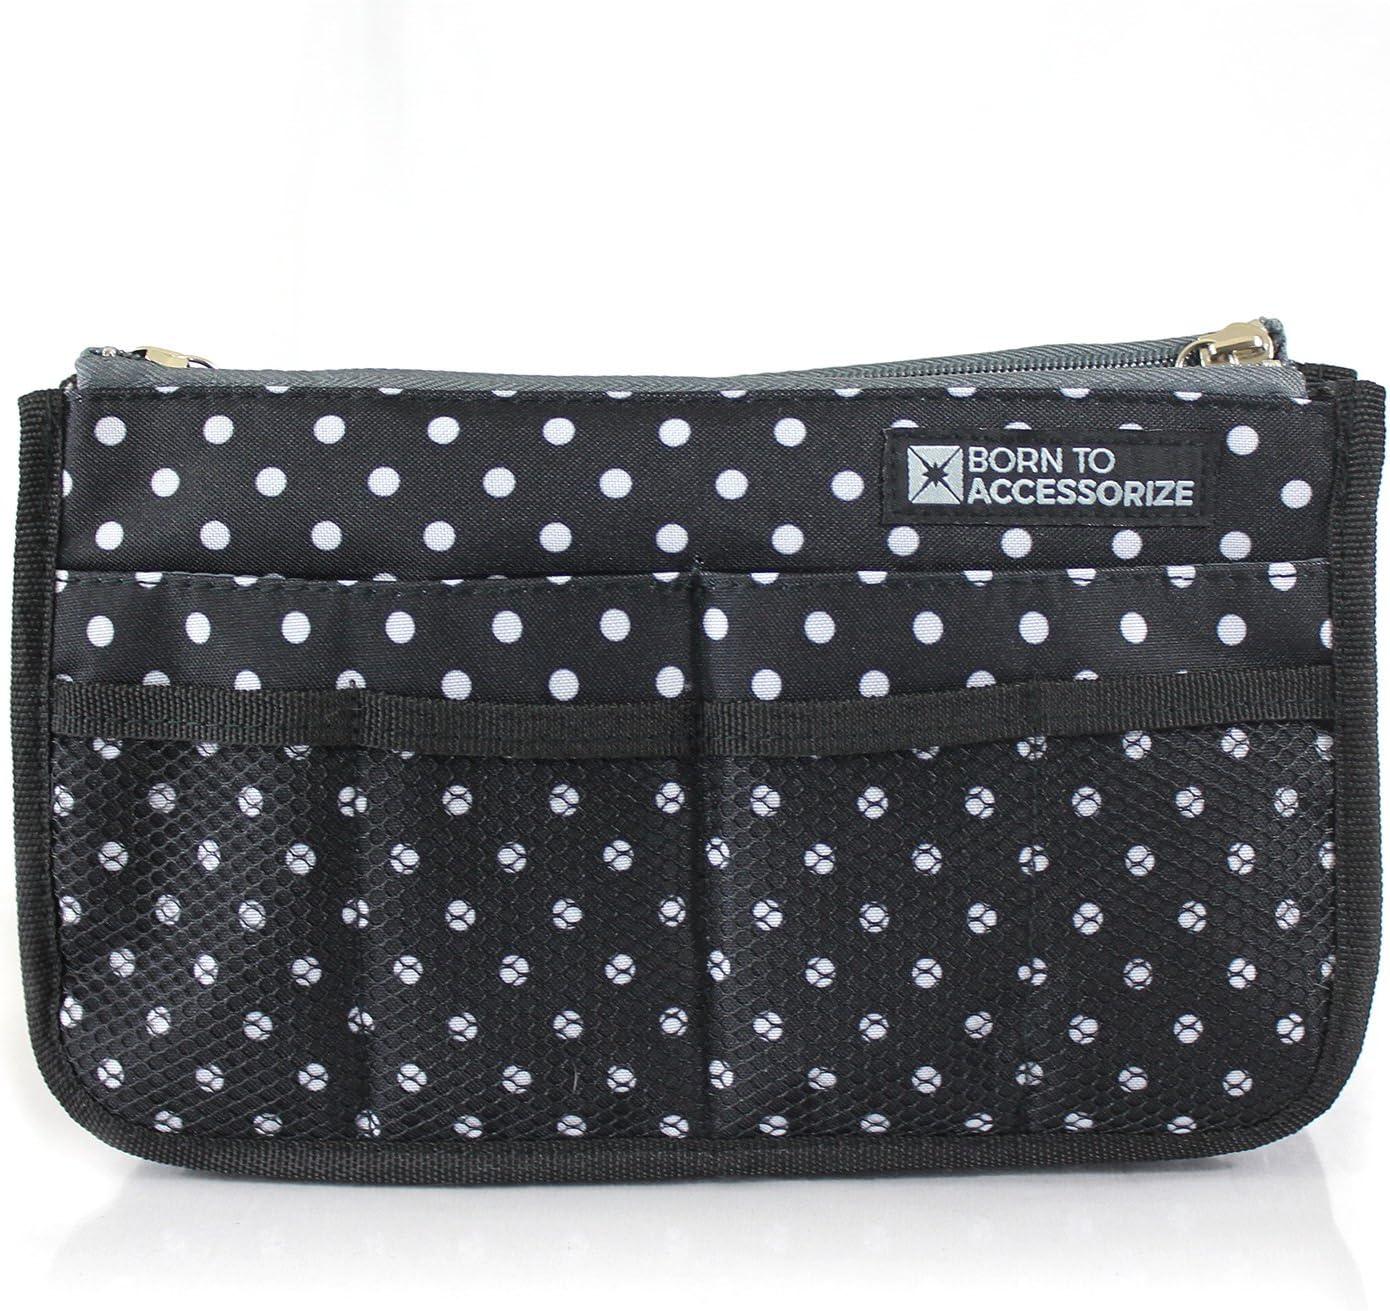 Handbag Purse Organizer half in Over item handling Premium Sturdy - Polyester Bag Insert